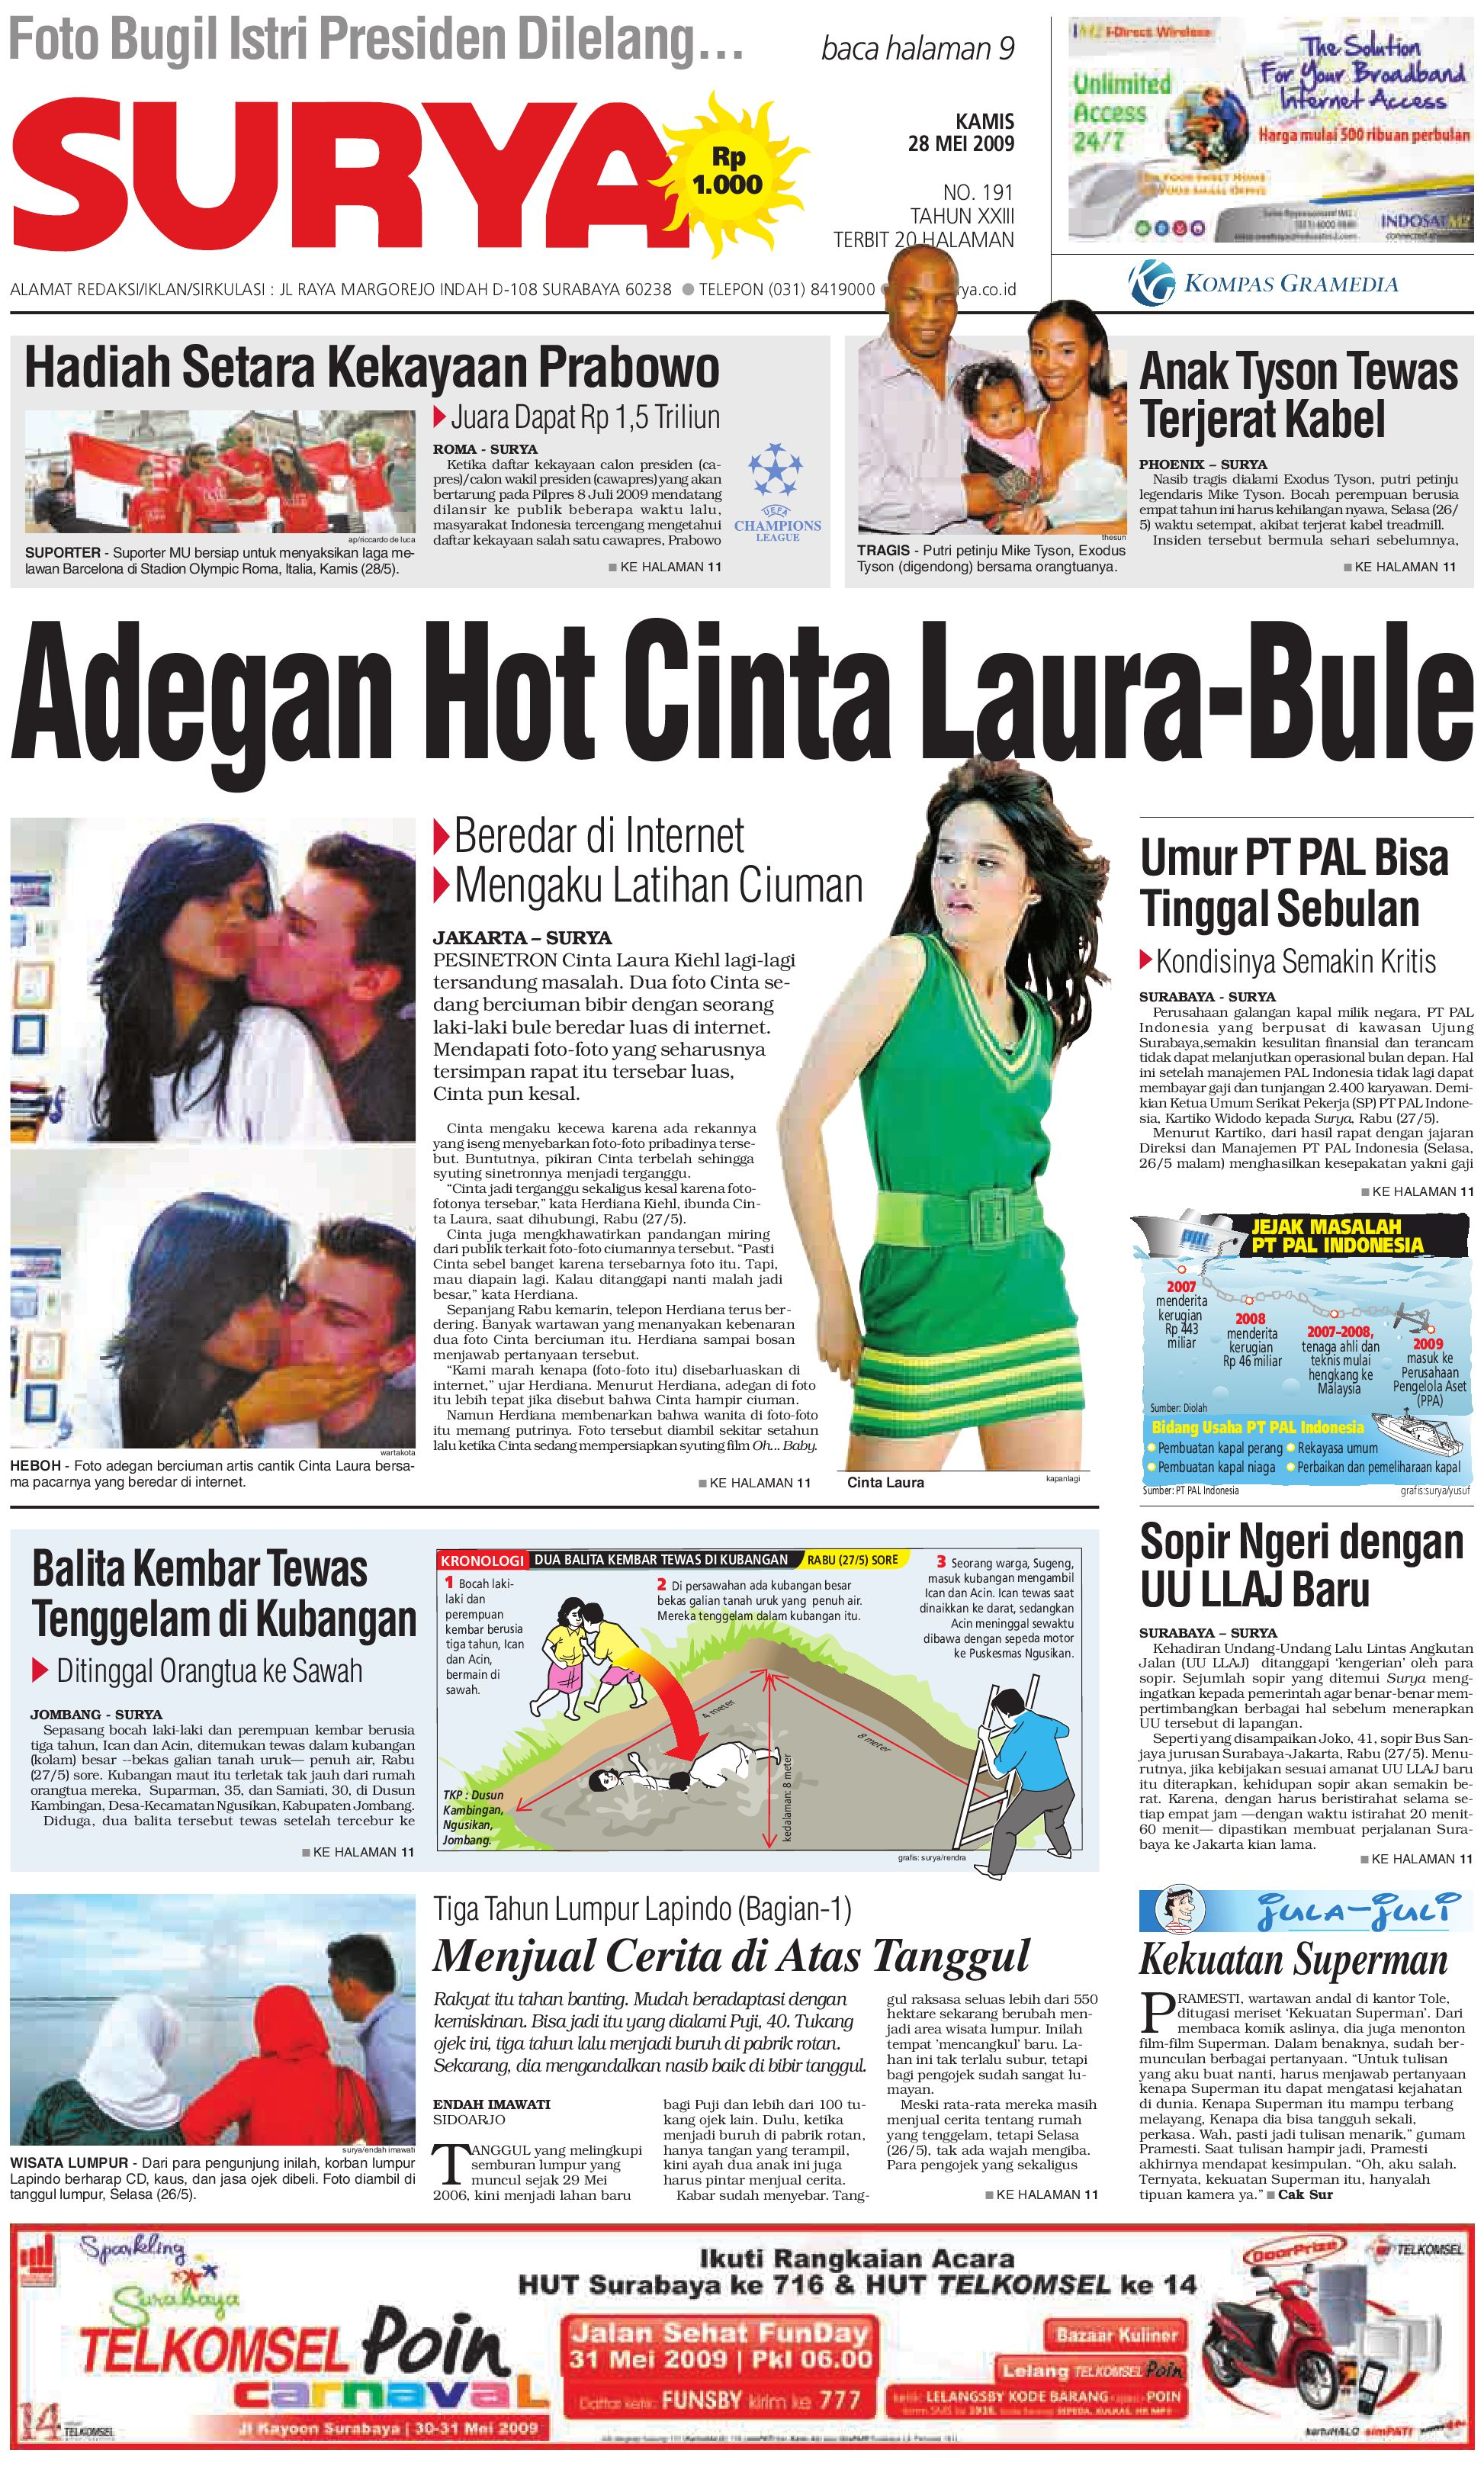 Surya Edisi Cetak 27 Mei 2009 By Harian Issuu Produk Ukm Bumn Tas Phiton Kembang Orchid